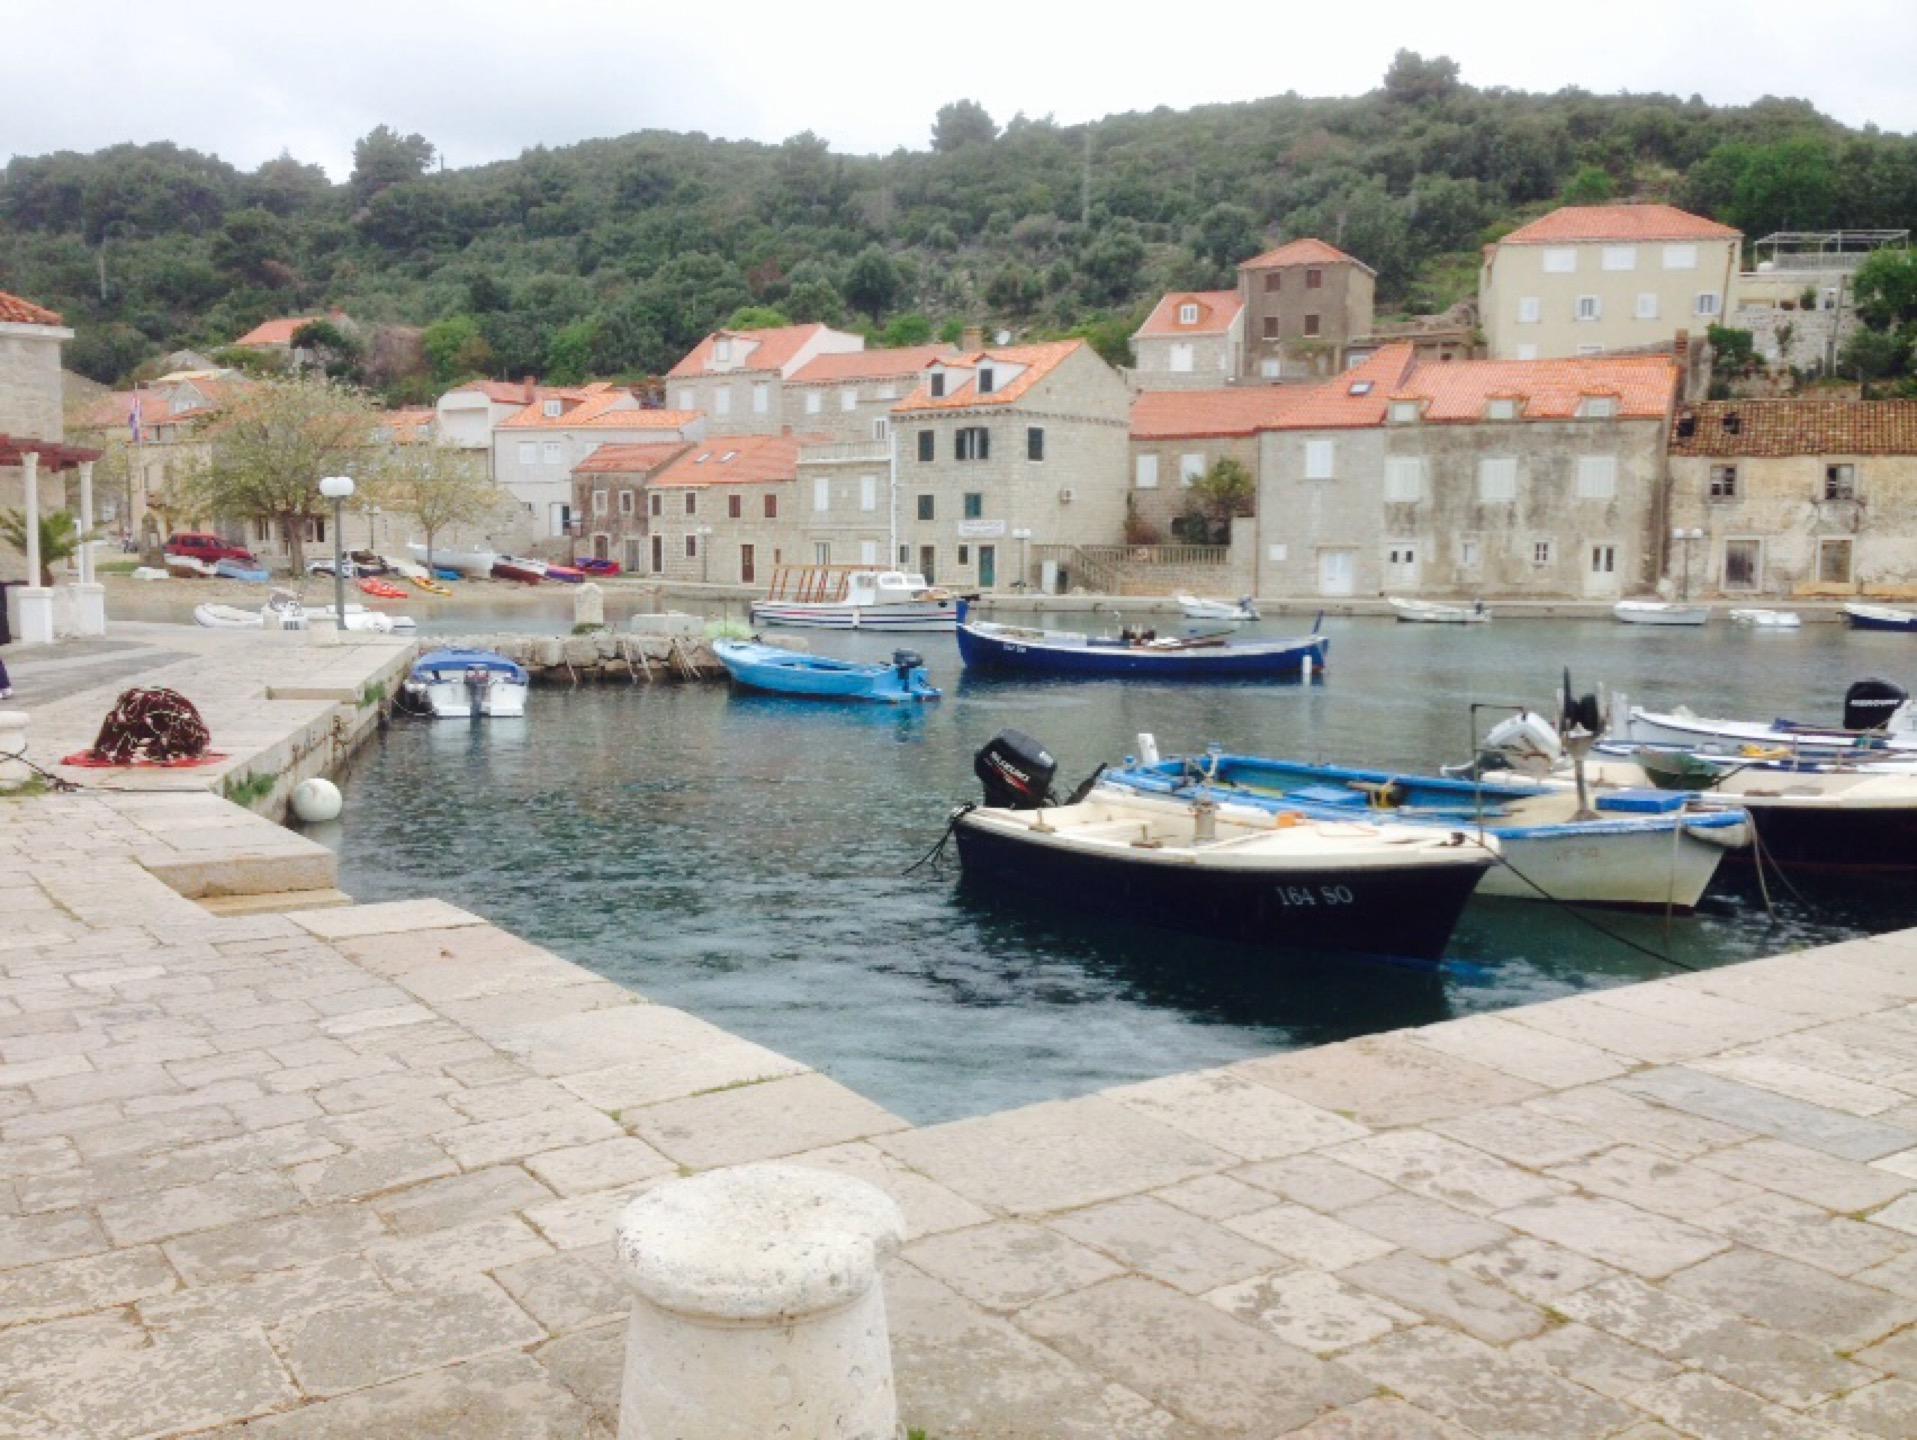 I'm at Sudurad, Šipan in Dubrovnik, Dubrovnik-Neretva https://t.co/9G6vBj8trw http://t.co/JVCktOMJod